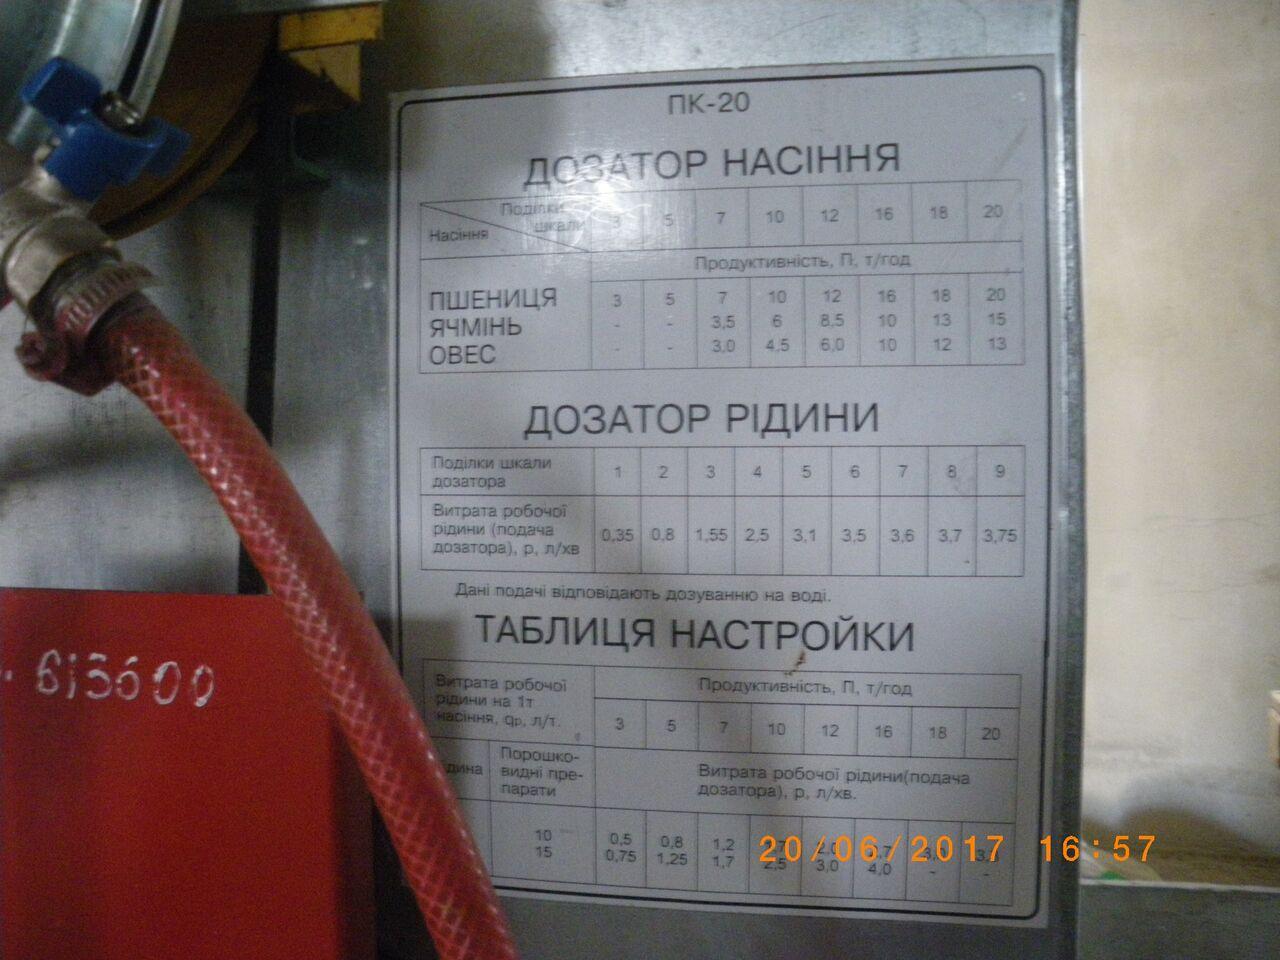 protravlyuvach_super_pk_20